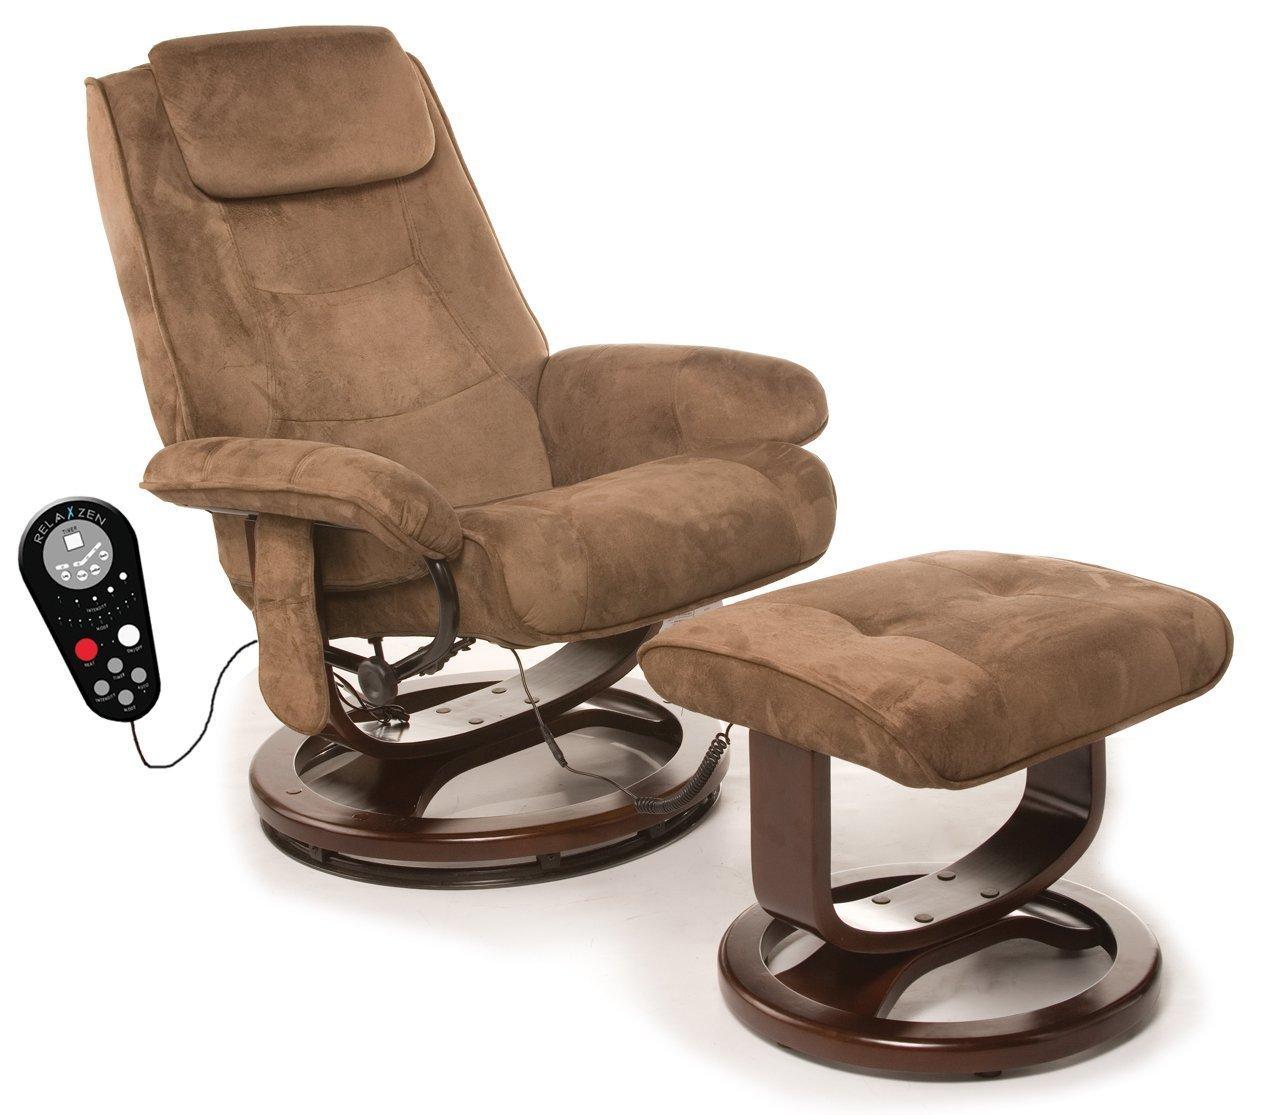 reclining chairs amazon.com: relaxzen 60-078011 deluxe leisure recliner chair with 8-motor  massage u0026 heat, OTGCOER